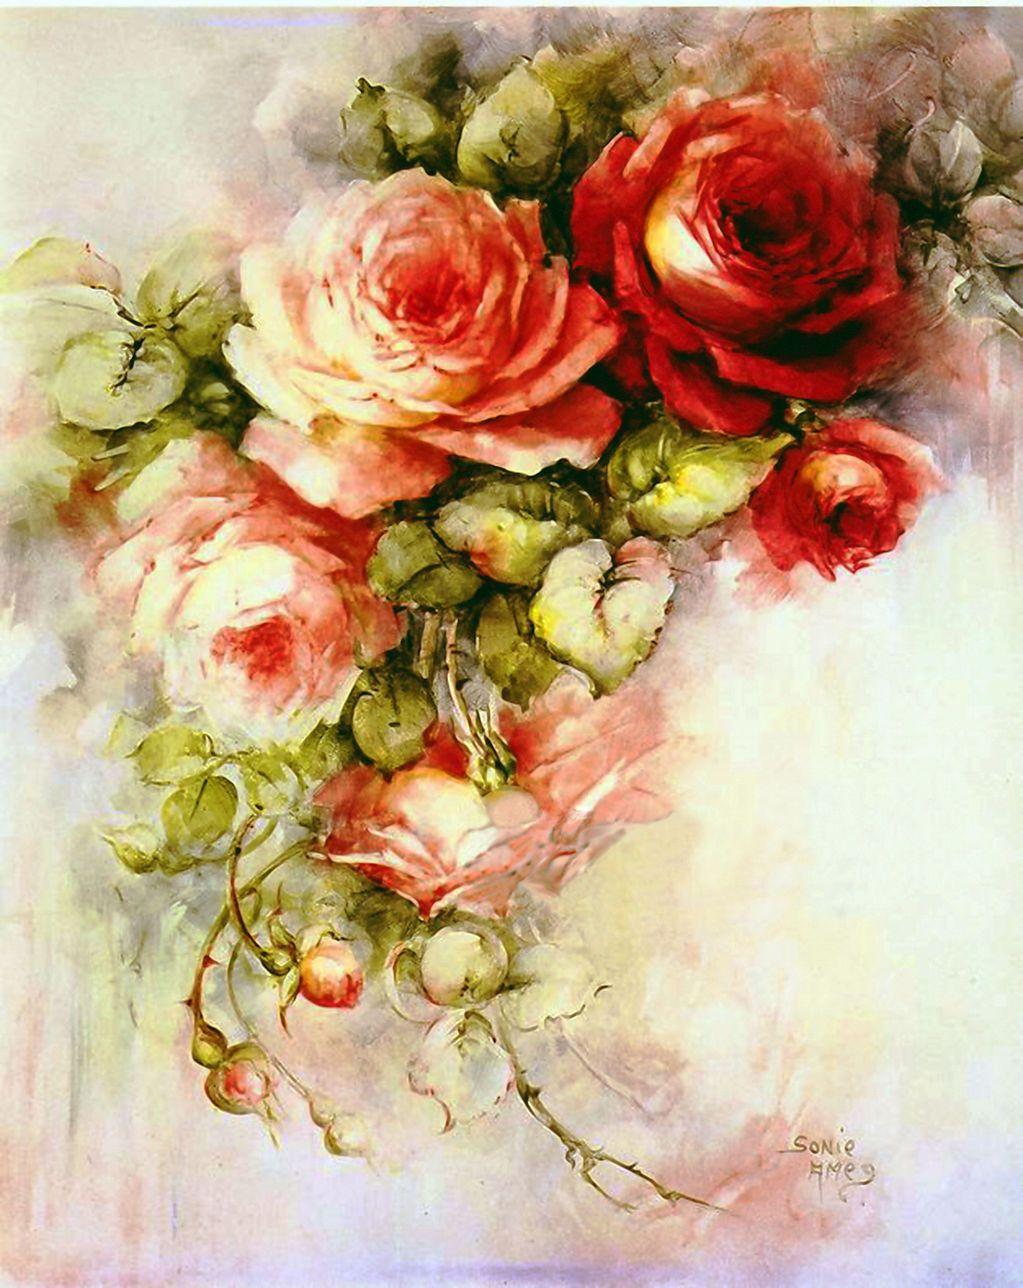 Rozovoe Nastroenie Flower Painting Vintage Roses Floral Art